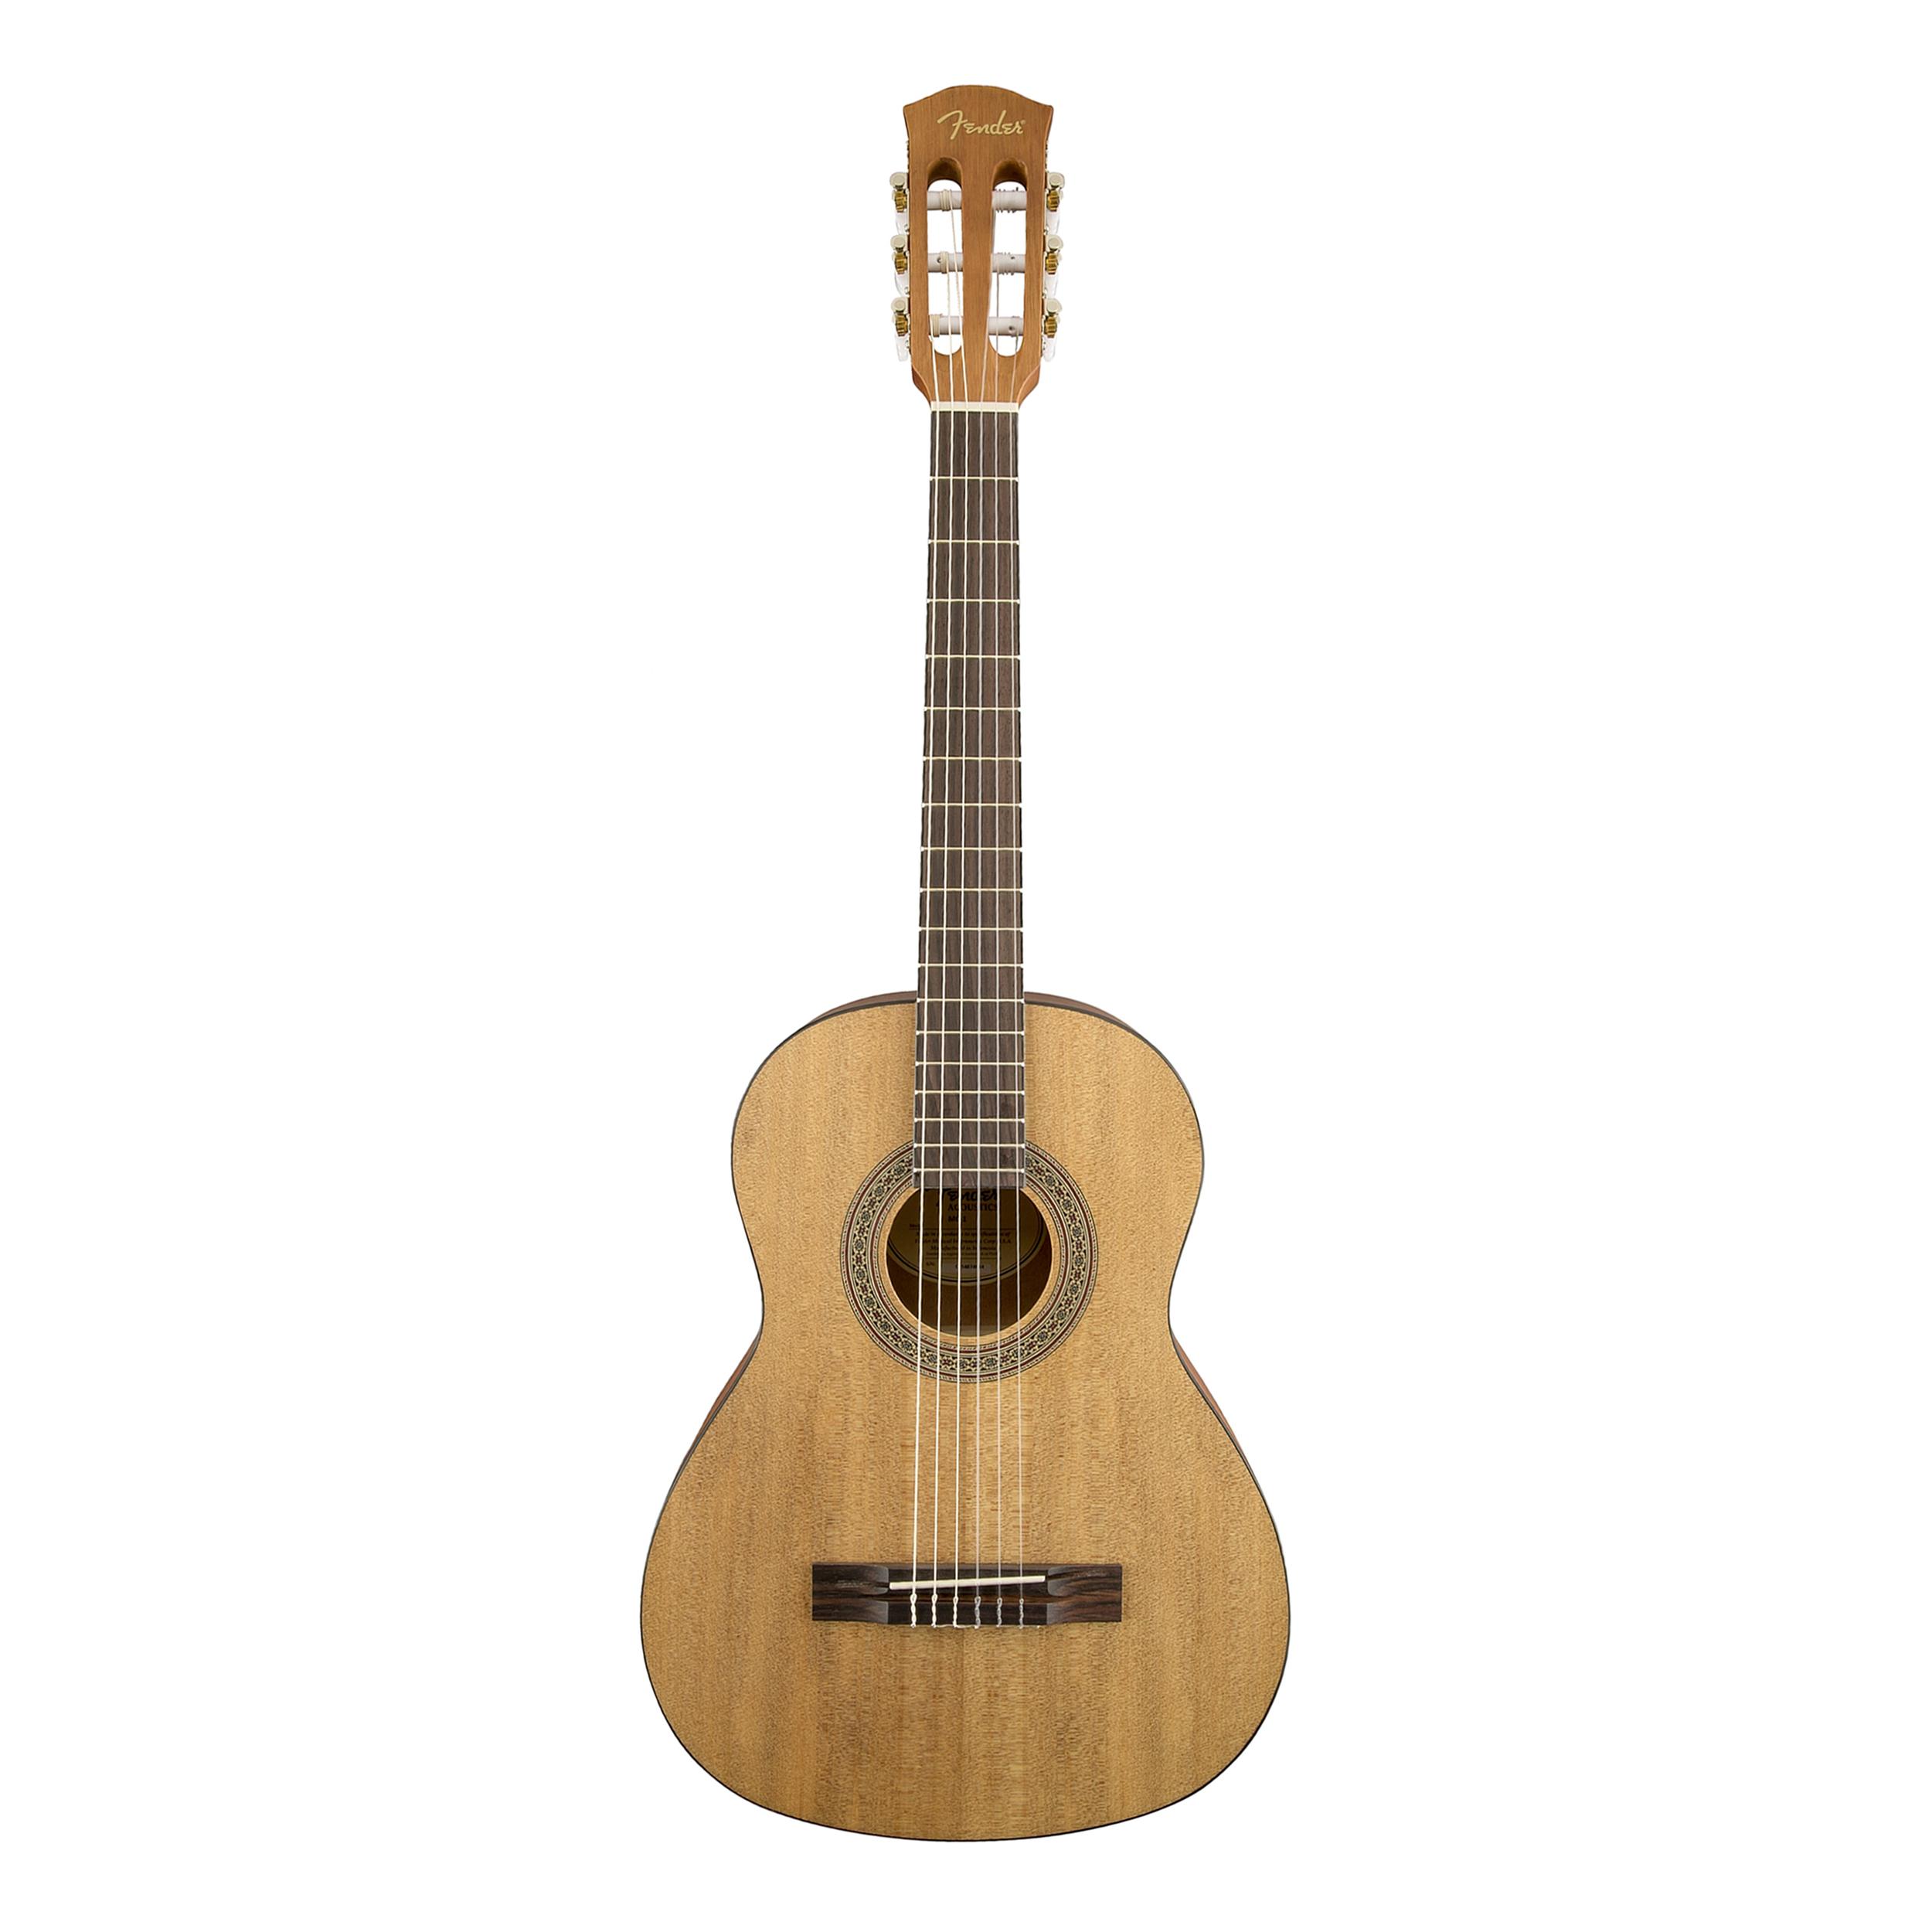 fender mc1 mini 3 4 size nylon string classical guitar ebay. Black Bedroom Furniture Sets. Home Design Ideas